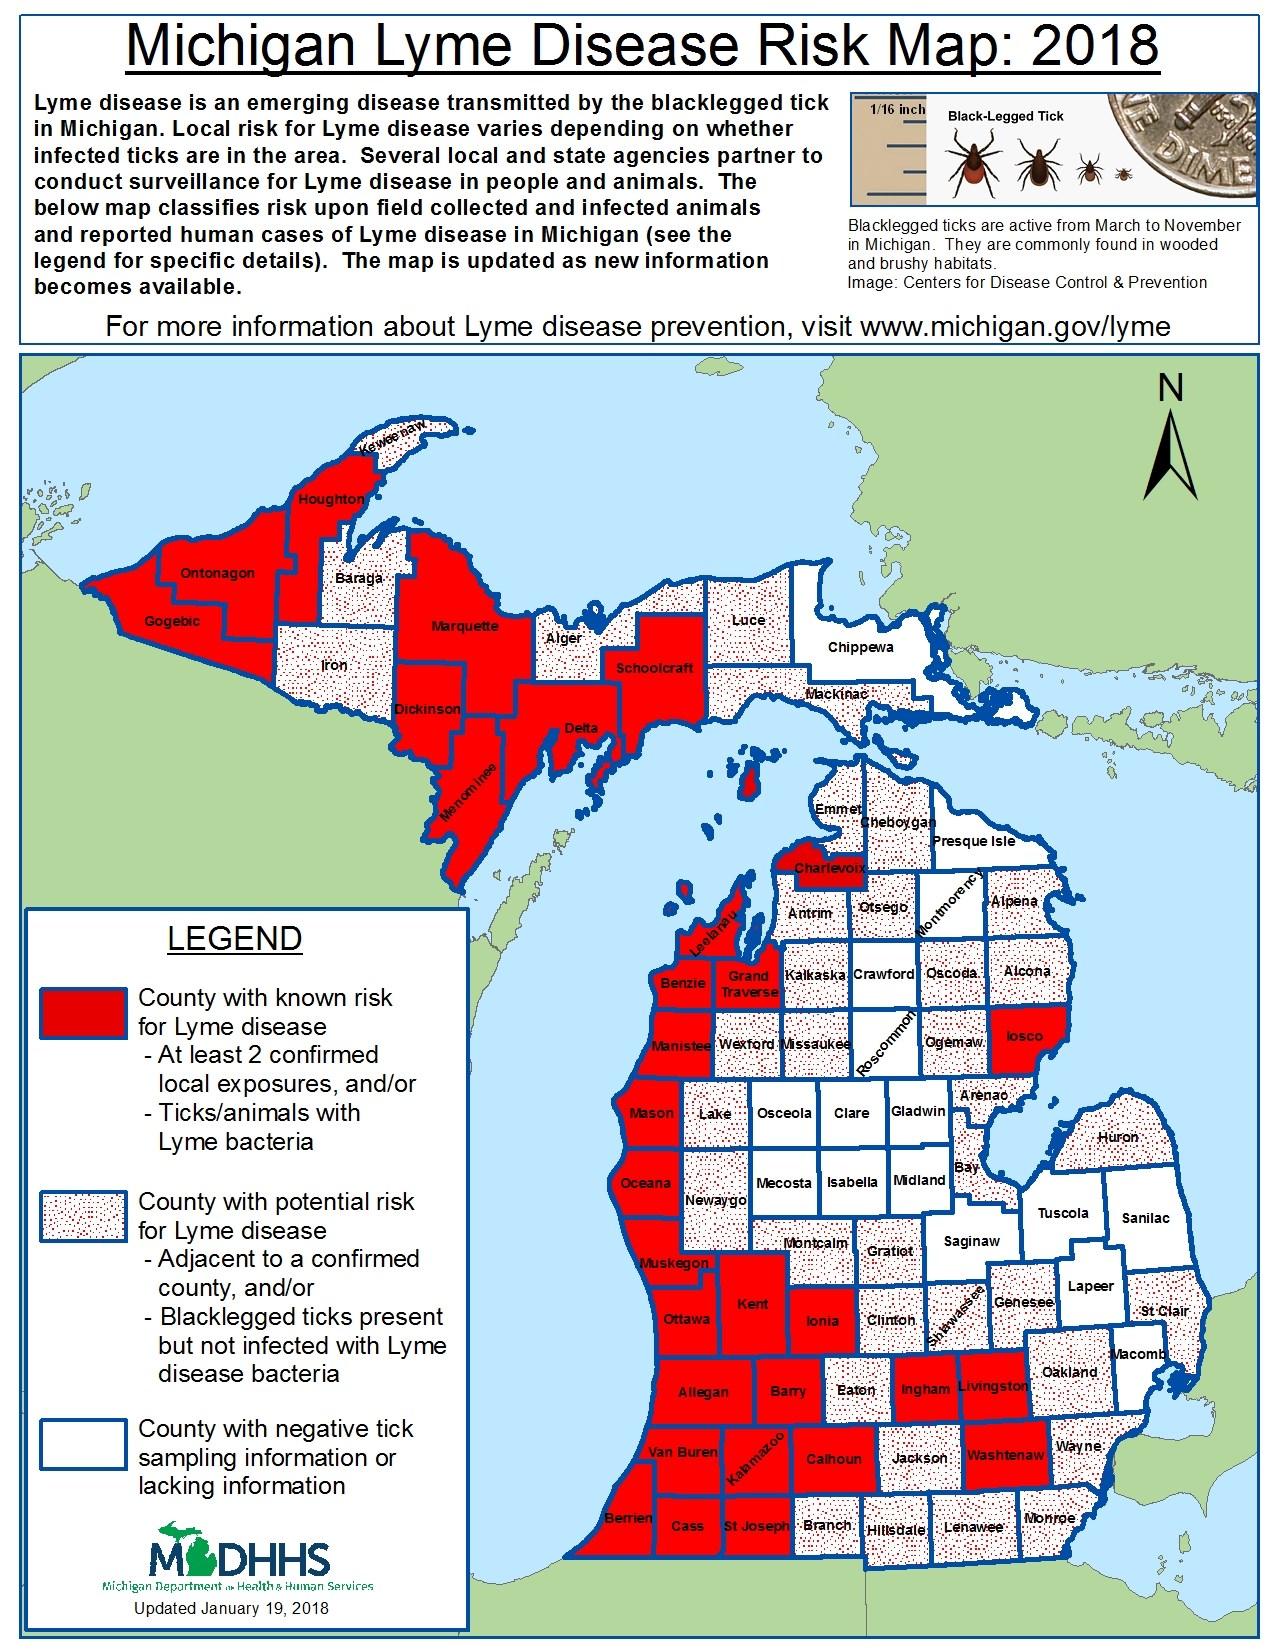 Source: State of Michigan